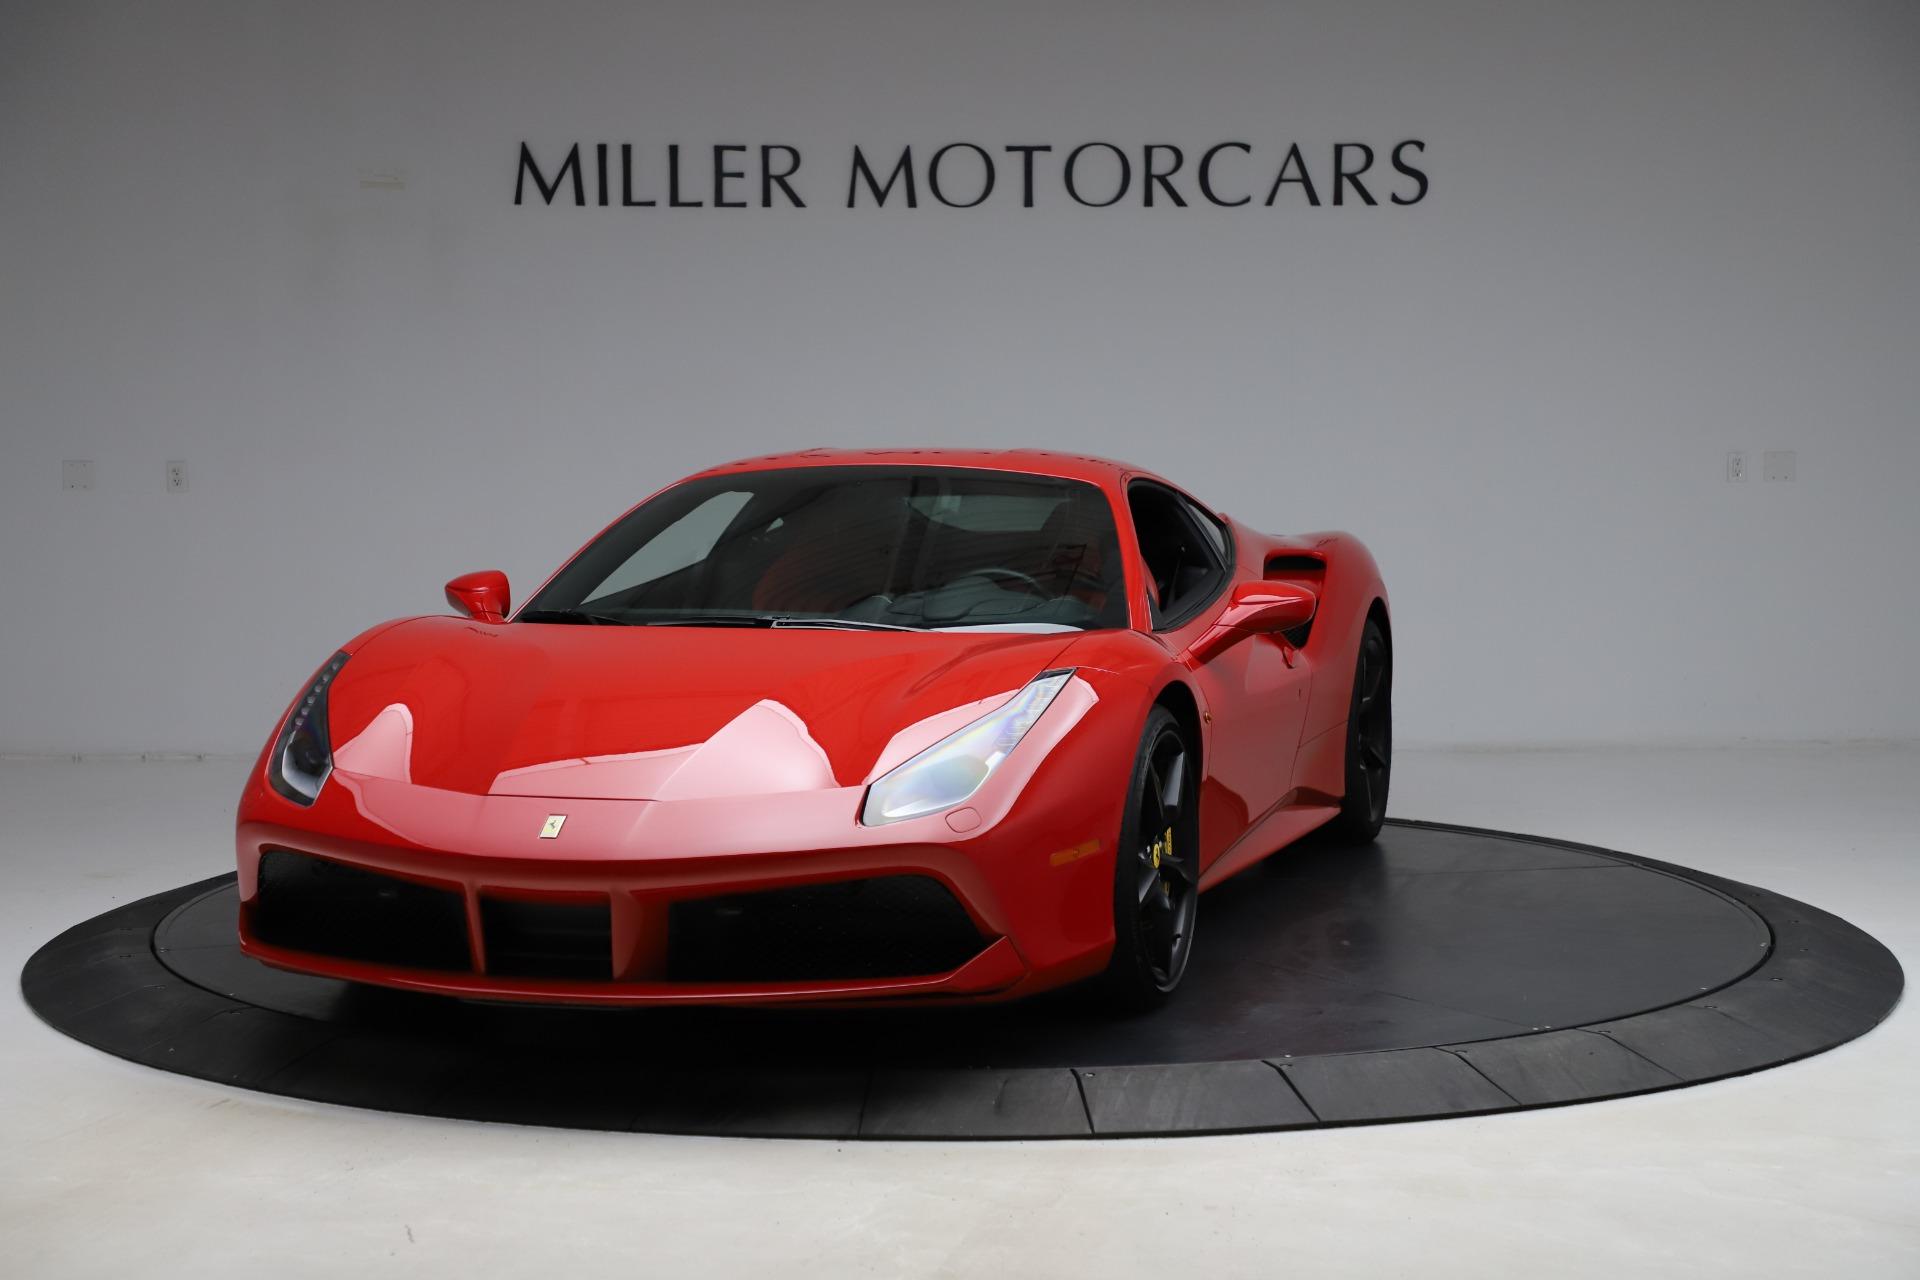 Used 2018 Ferrari 488 GTB for sale $209,900 at Rolls-Royce Motor Cars Greenwich in Greenwich CT 06830 1